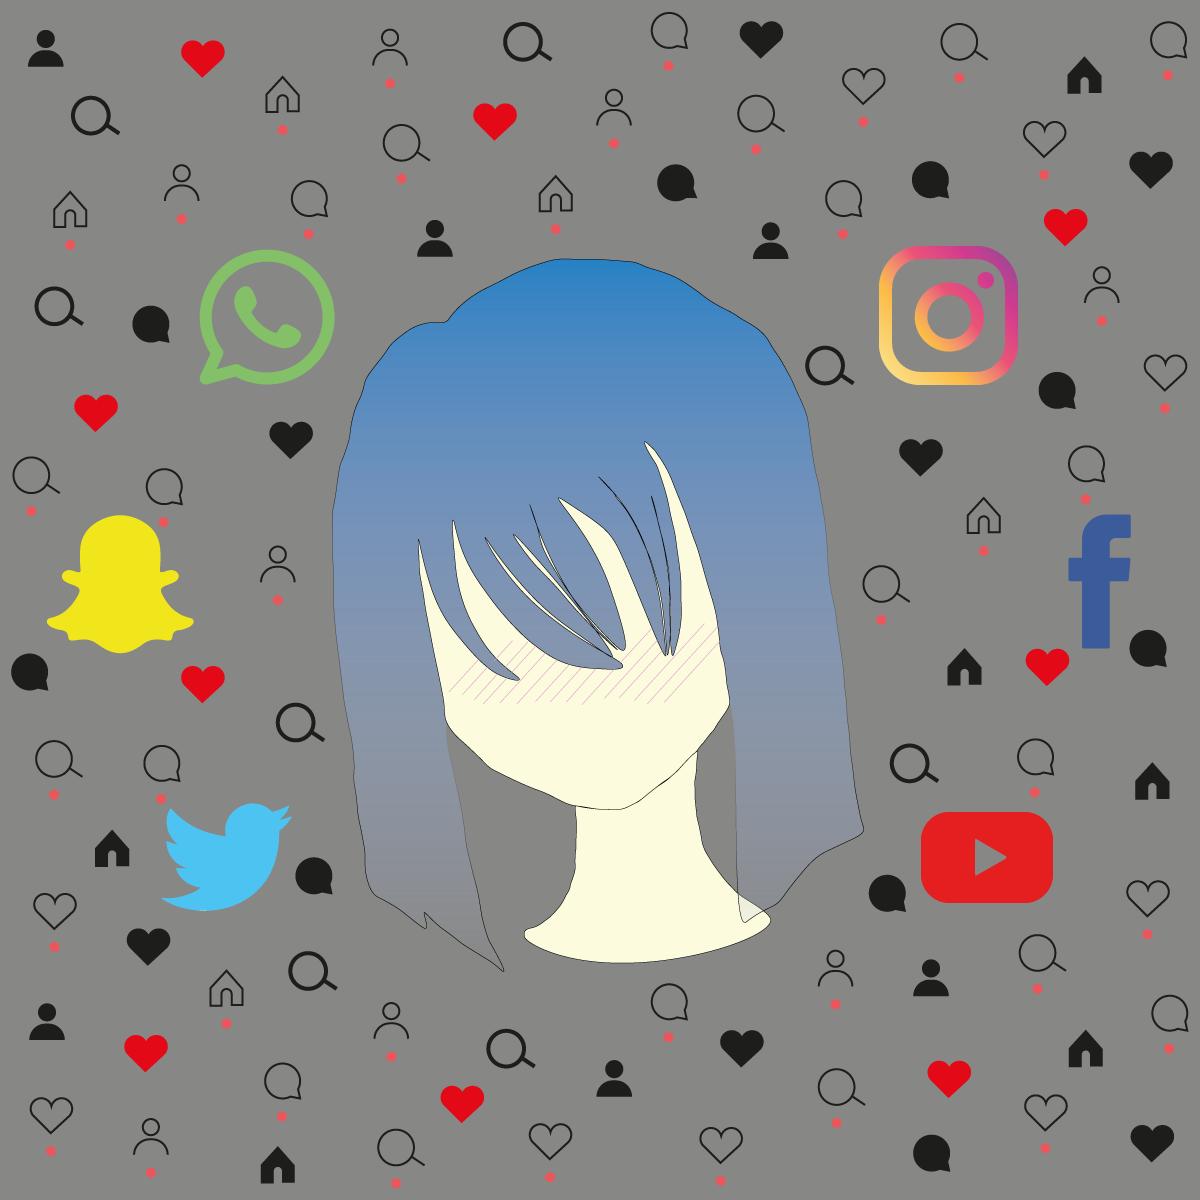 Chica sin rostro con pelo azul rodeada de iconos de redes sociales